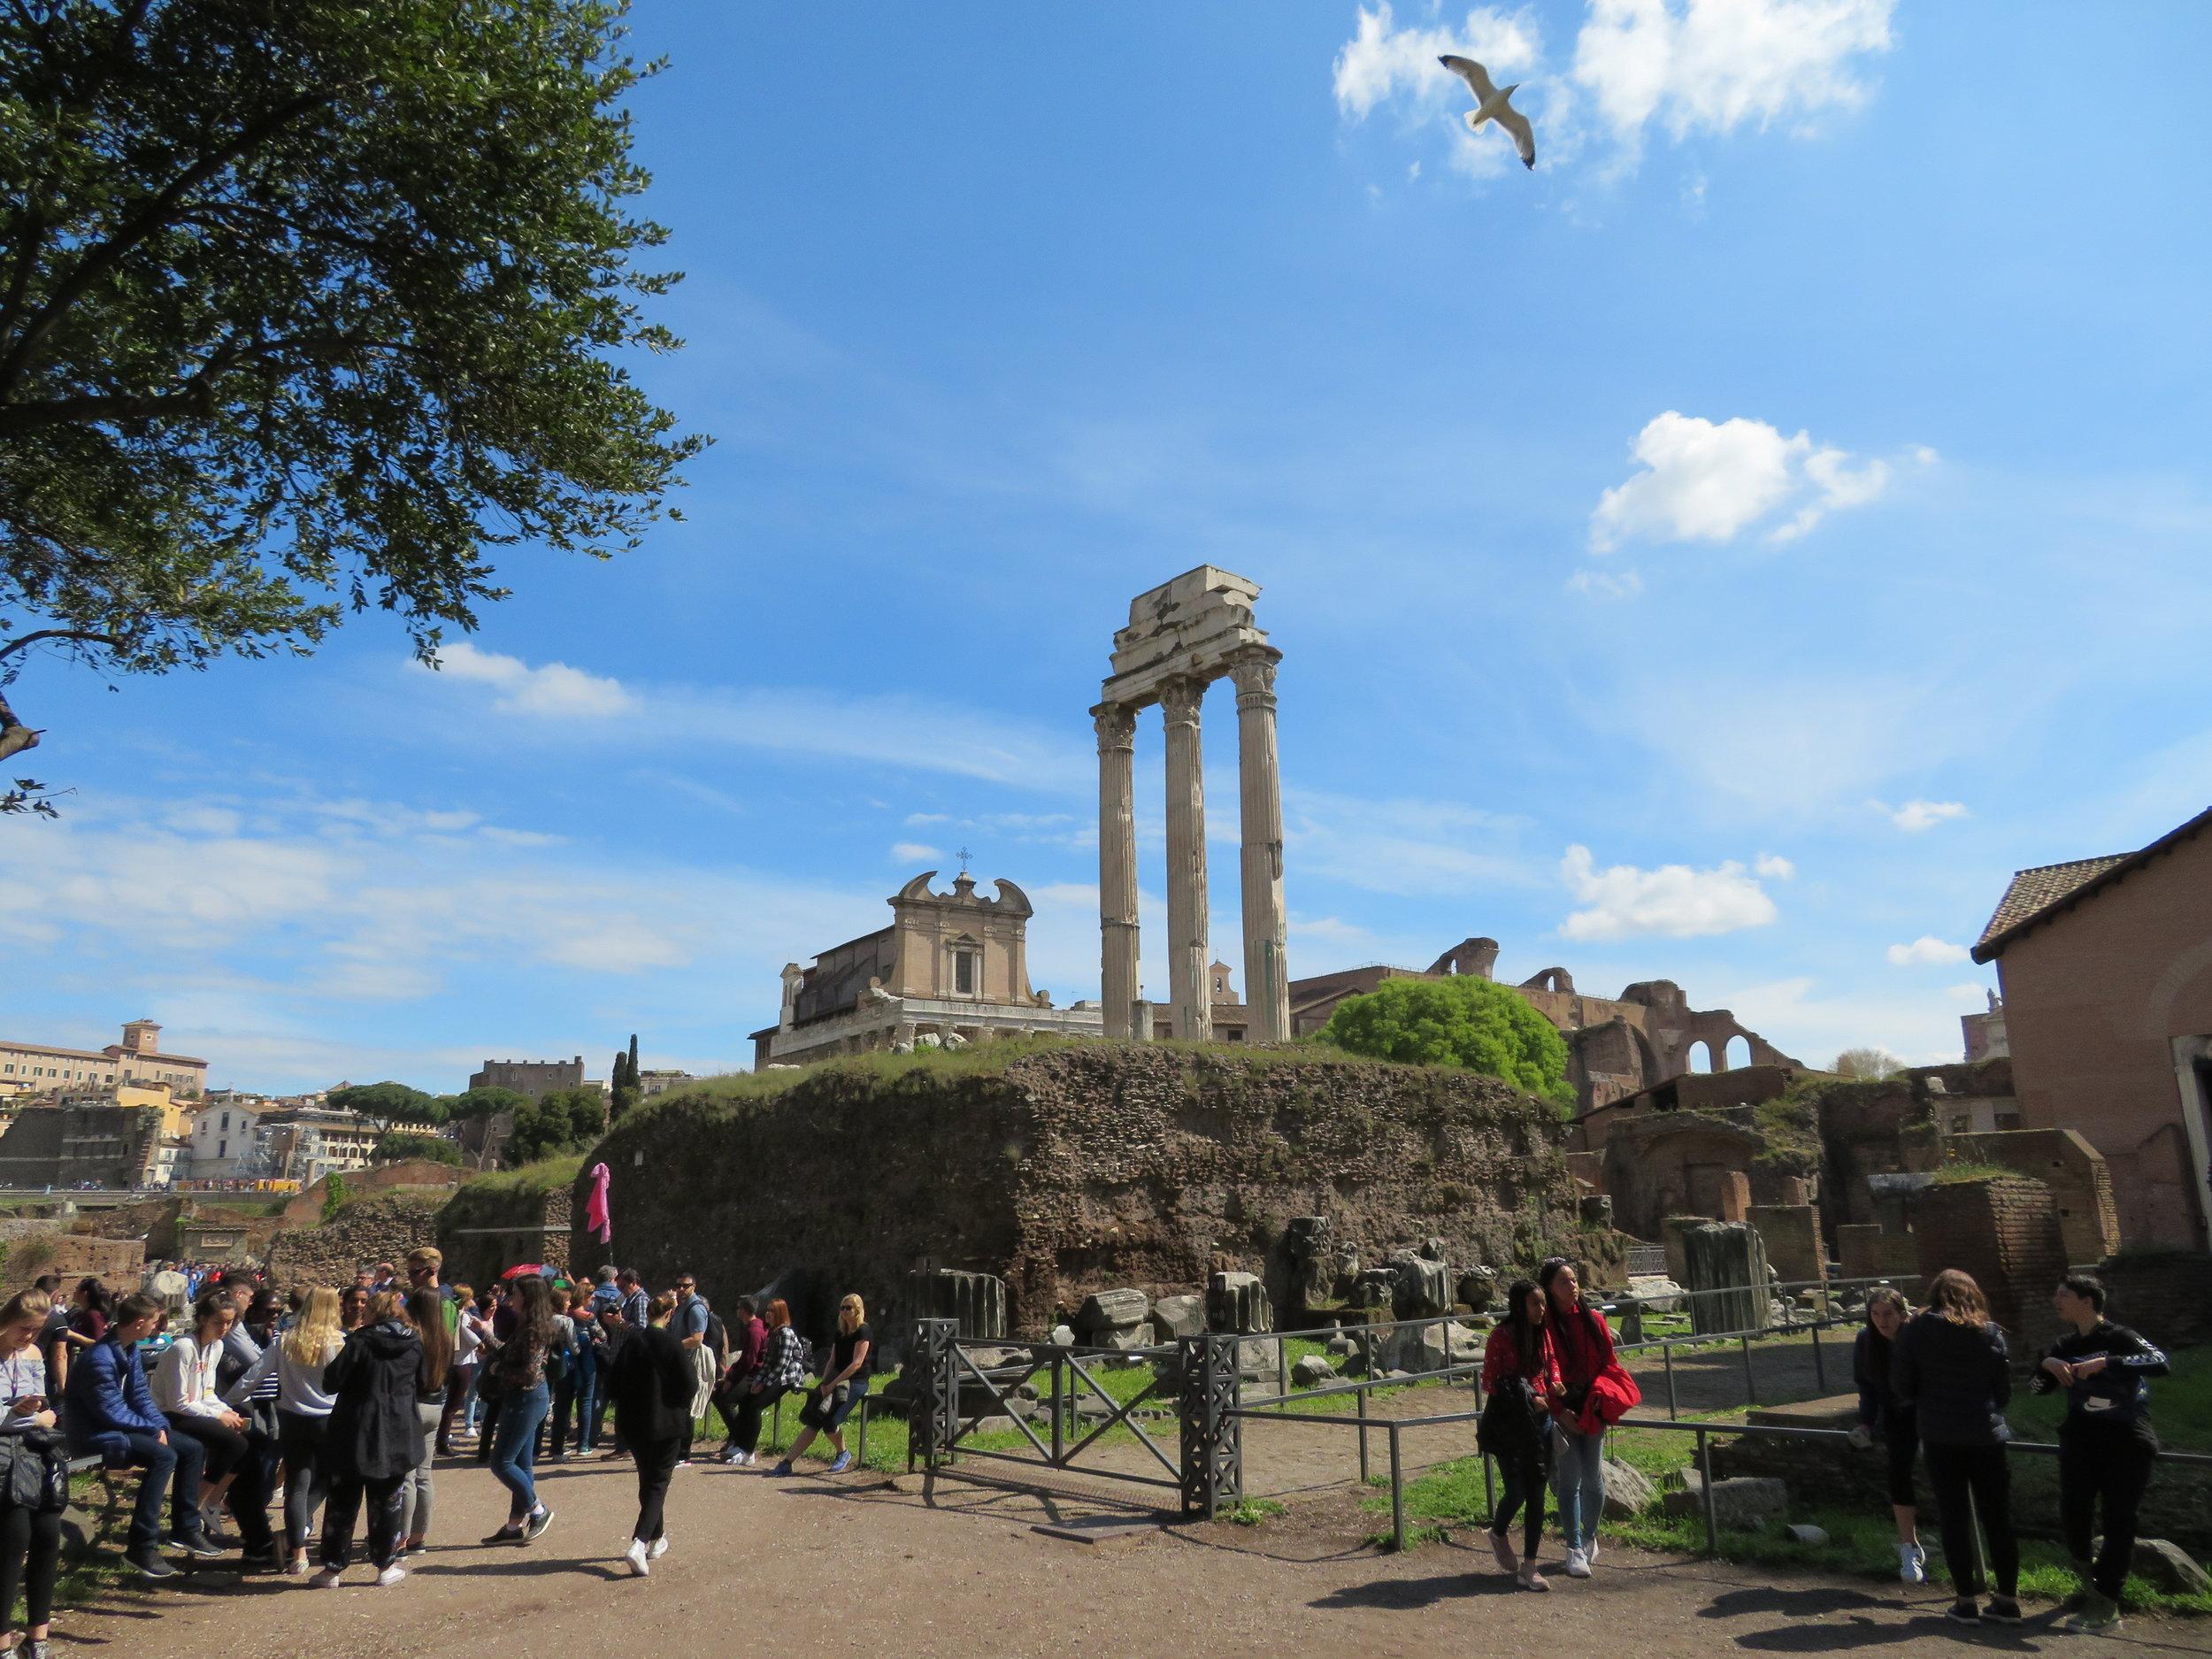 Colosseum_forum ruins.JPG